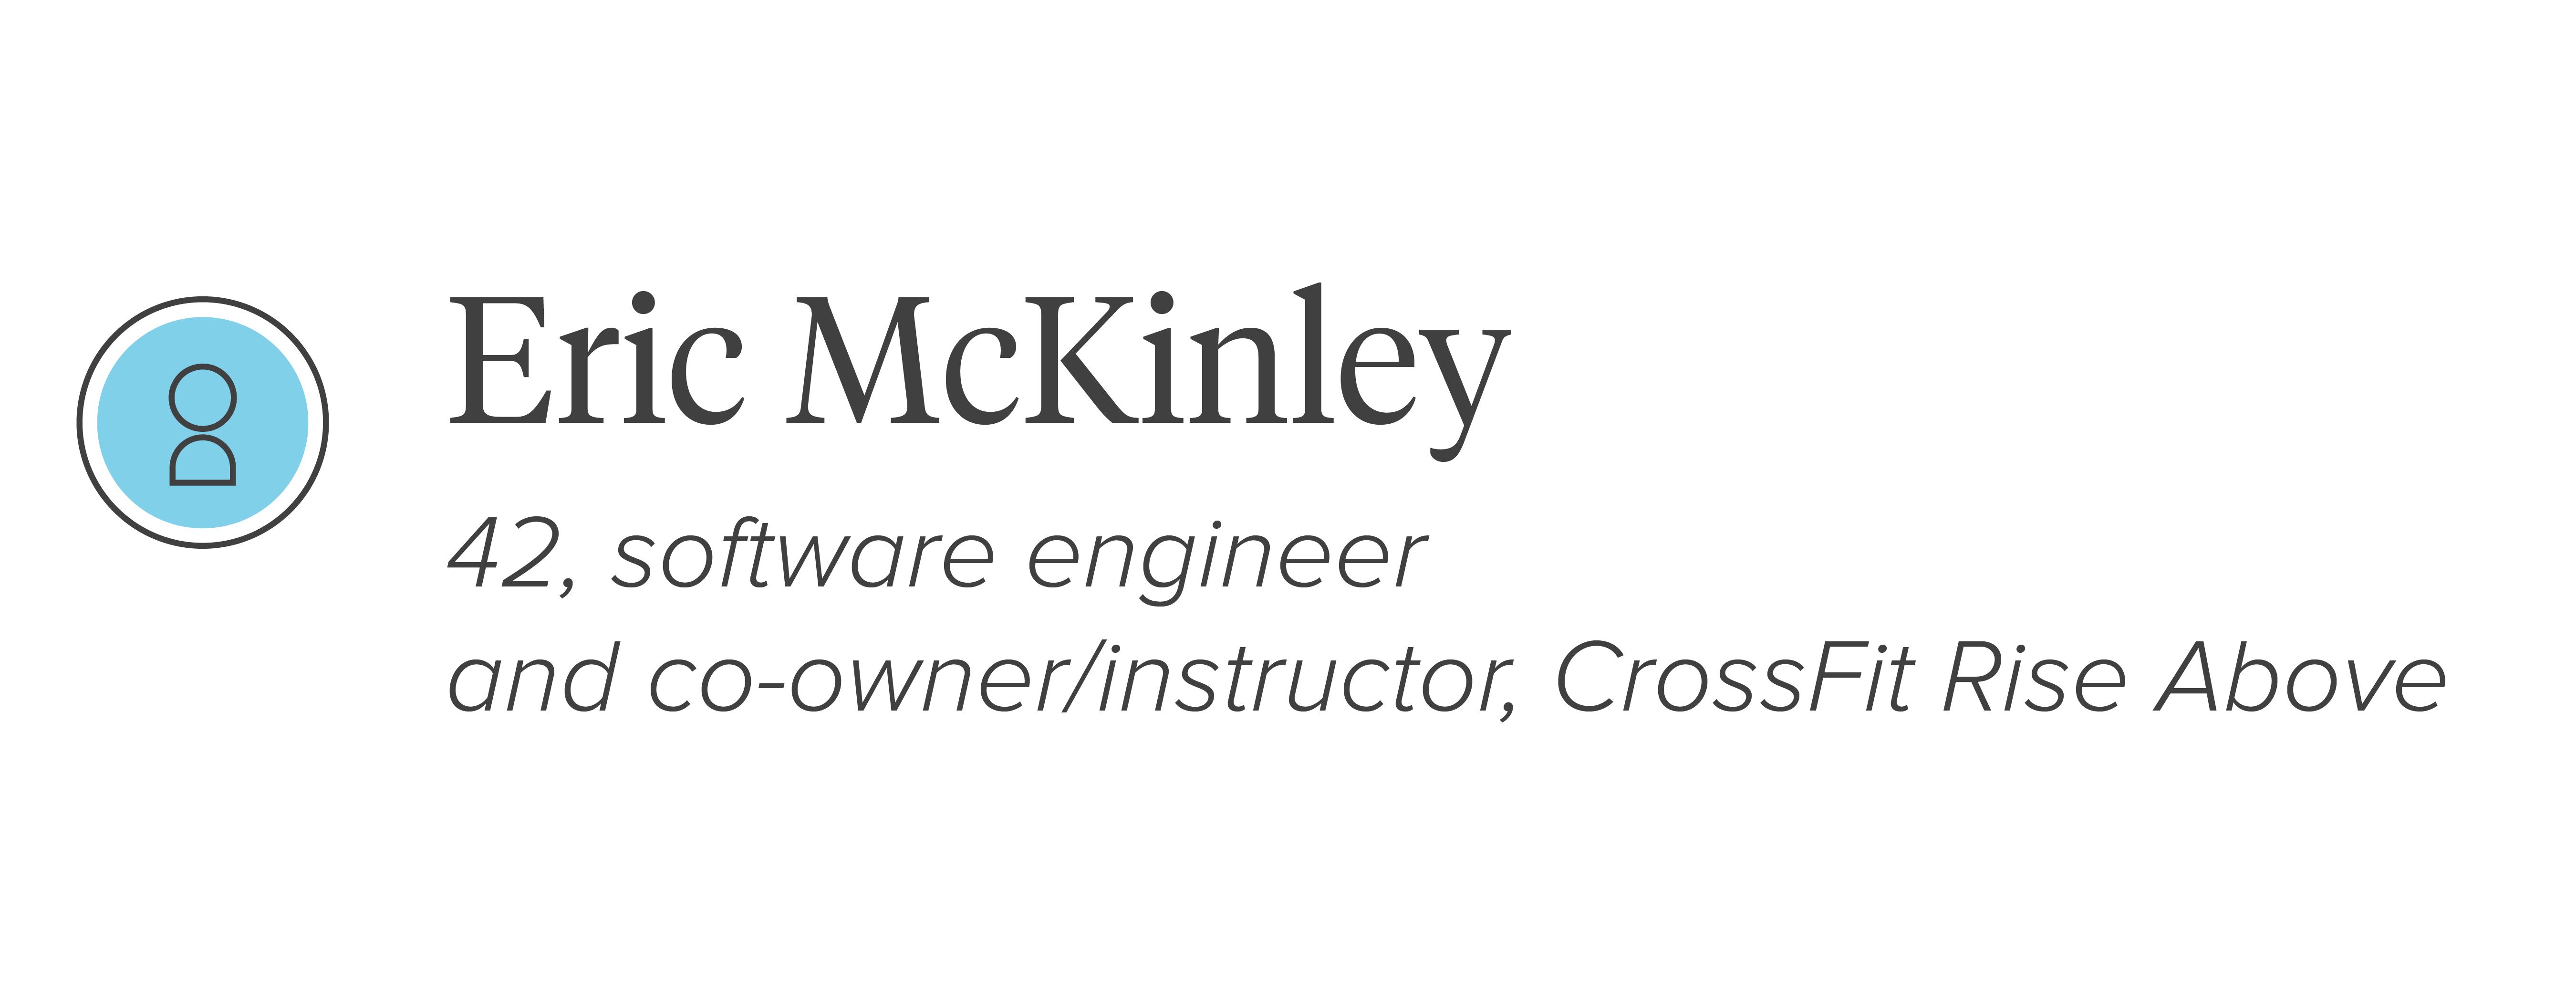 Eric McKinley